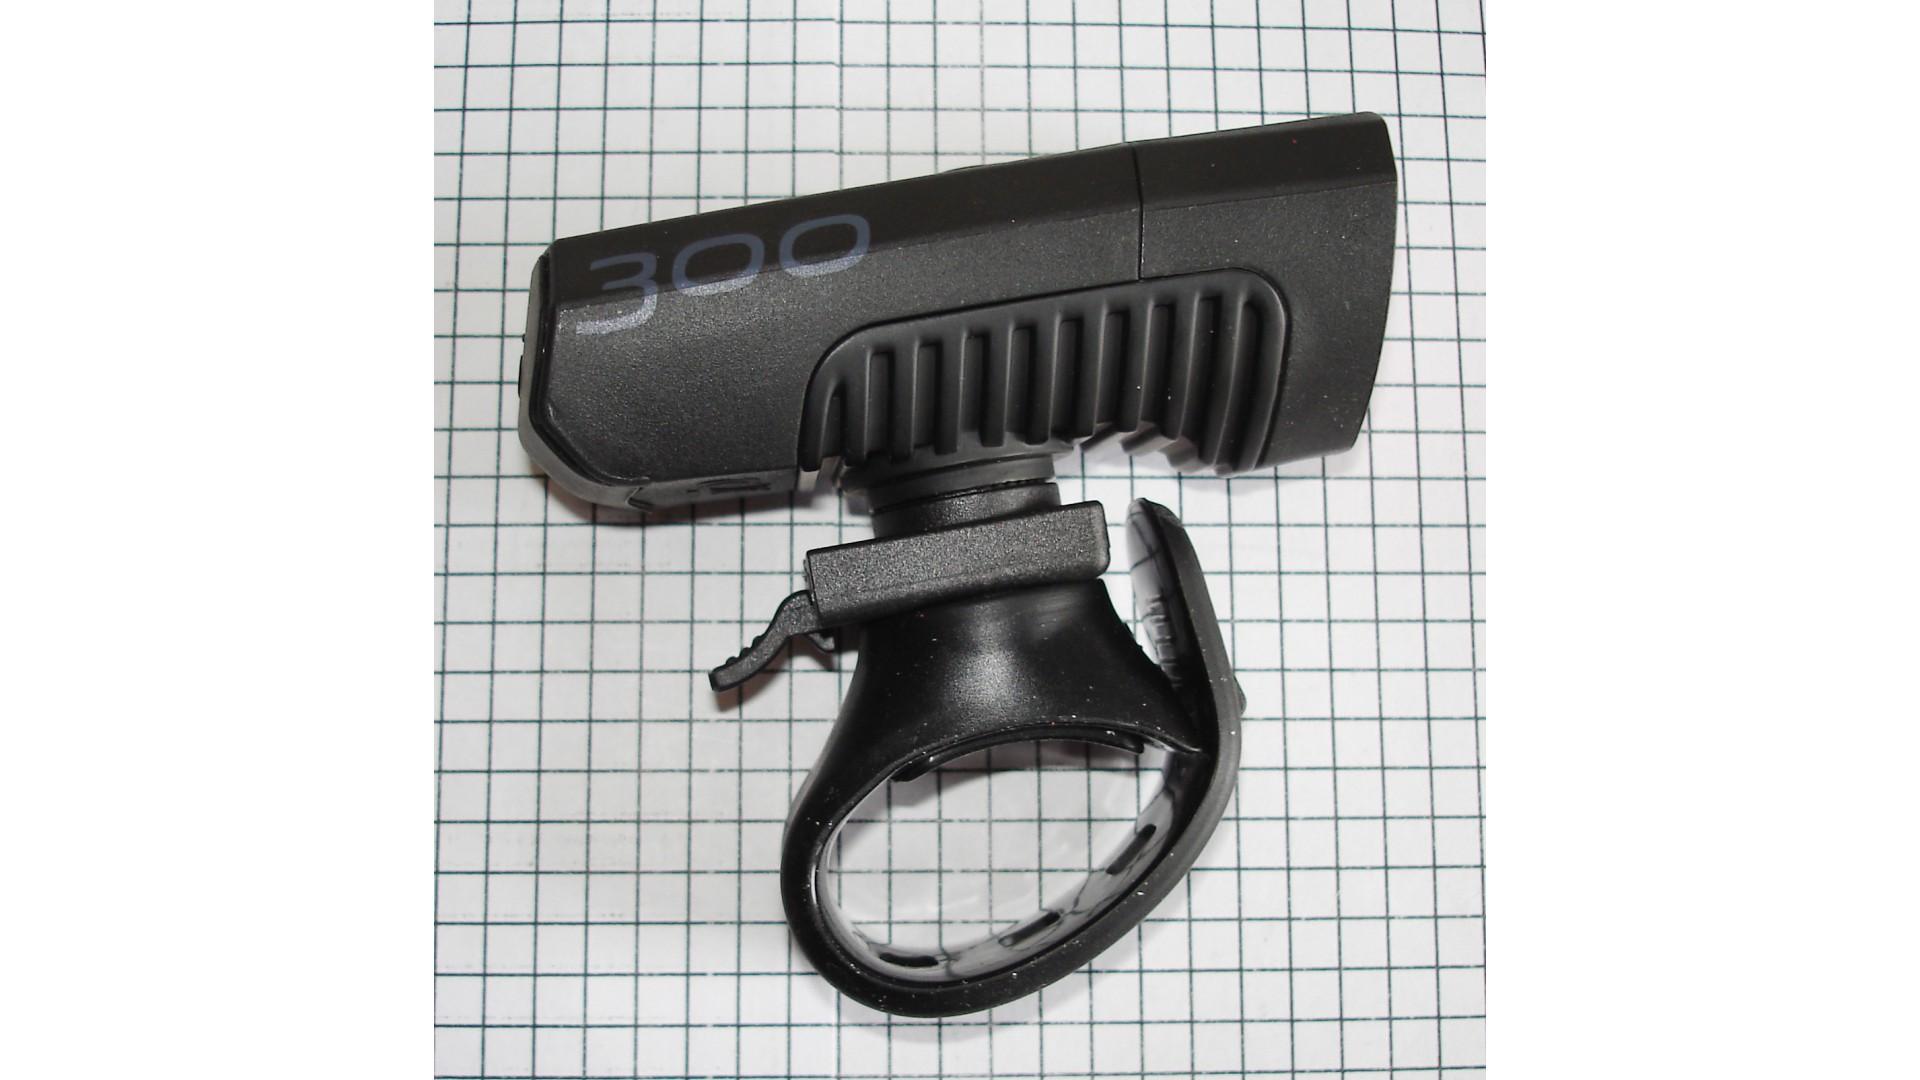 Фара передняя Sigma Buster 300/Nugget Flash 2 USB K-Set (комплект)